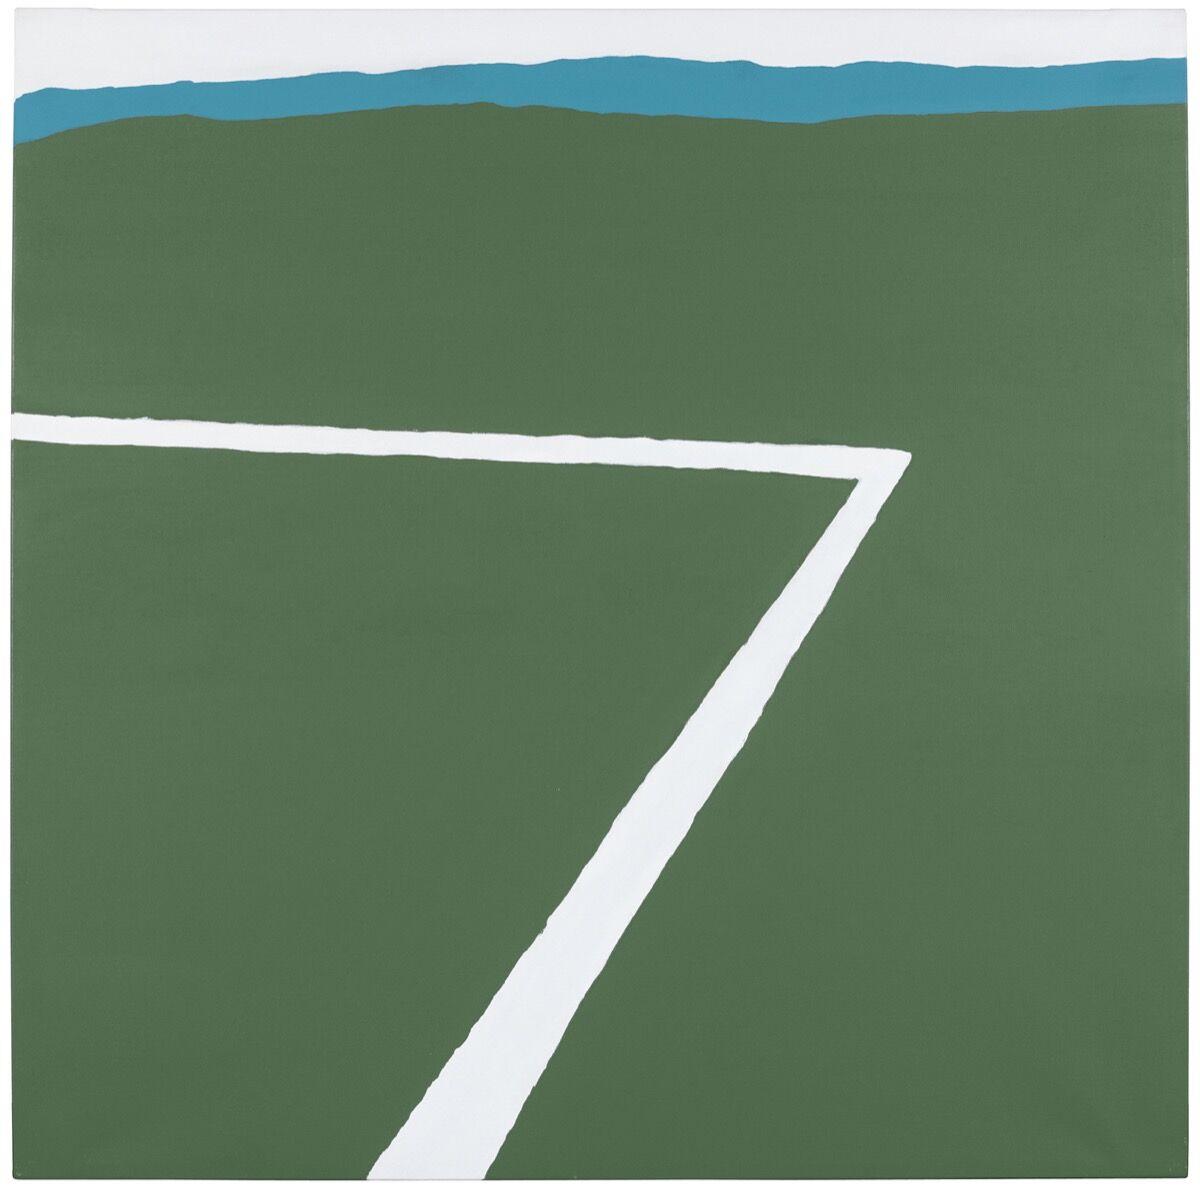 Raoul De Keyser, Kalklijin (Chalk Line), 1970. Courtesy of Christie's.